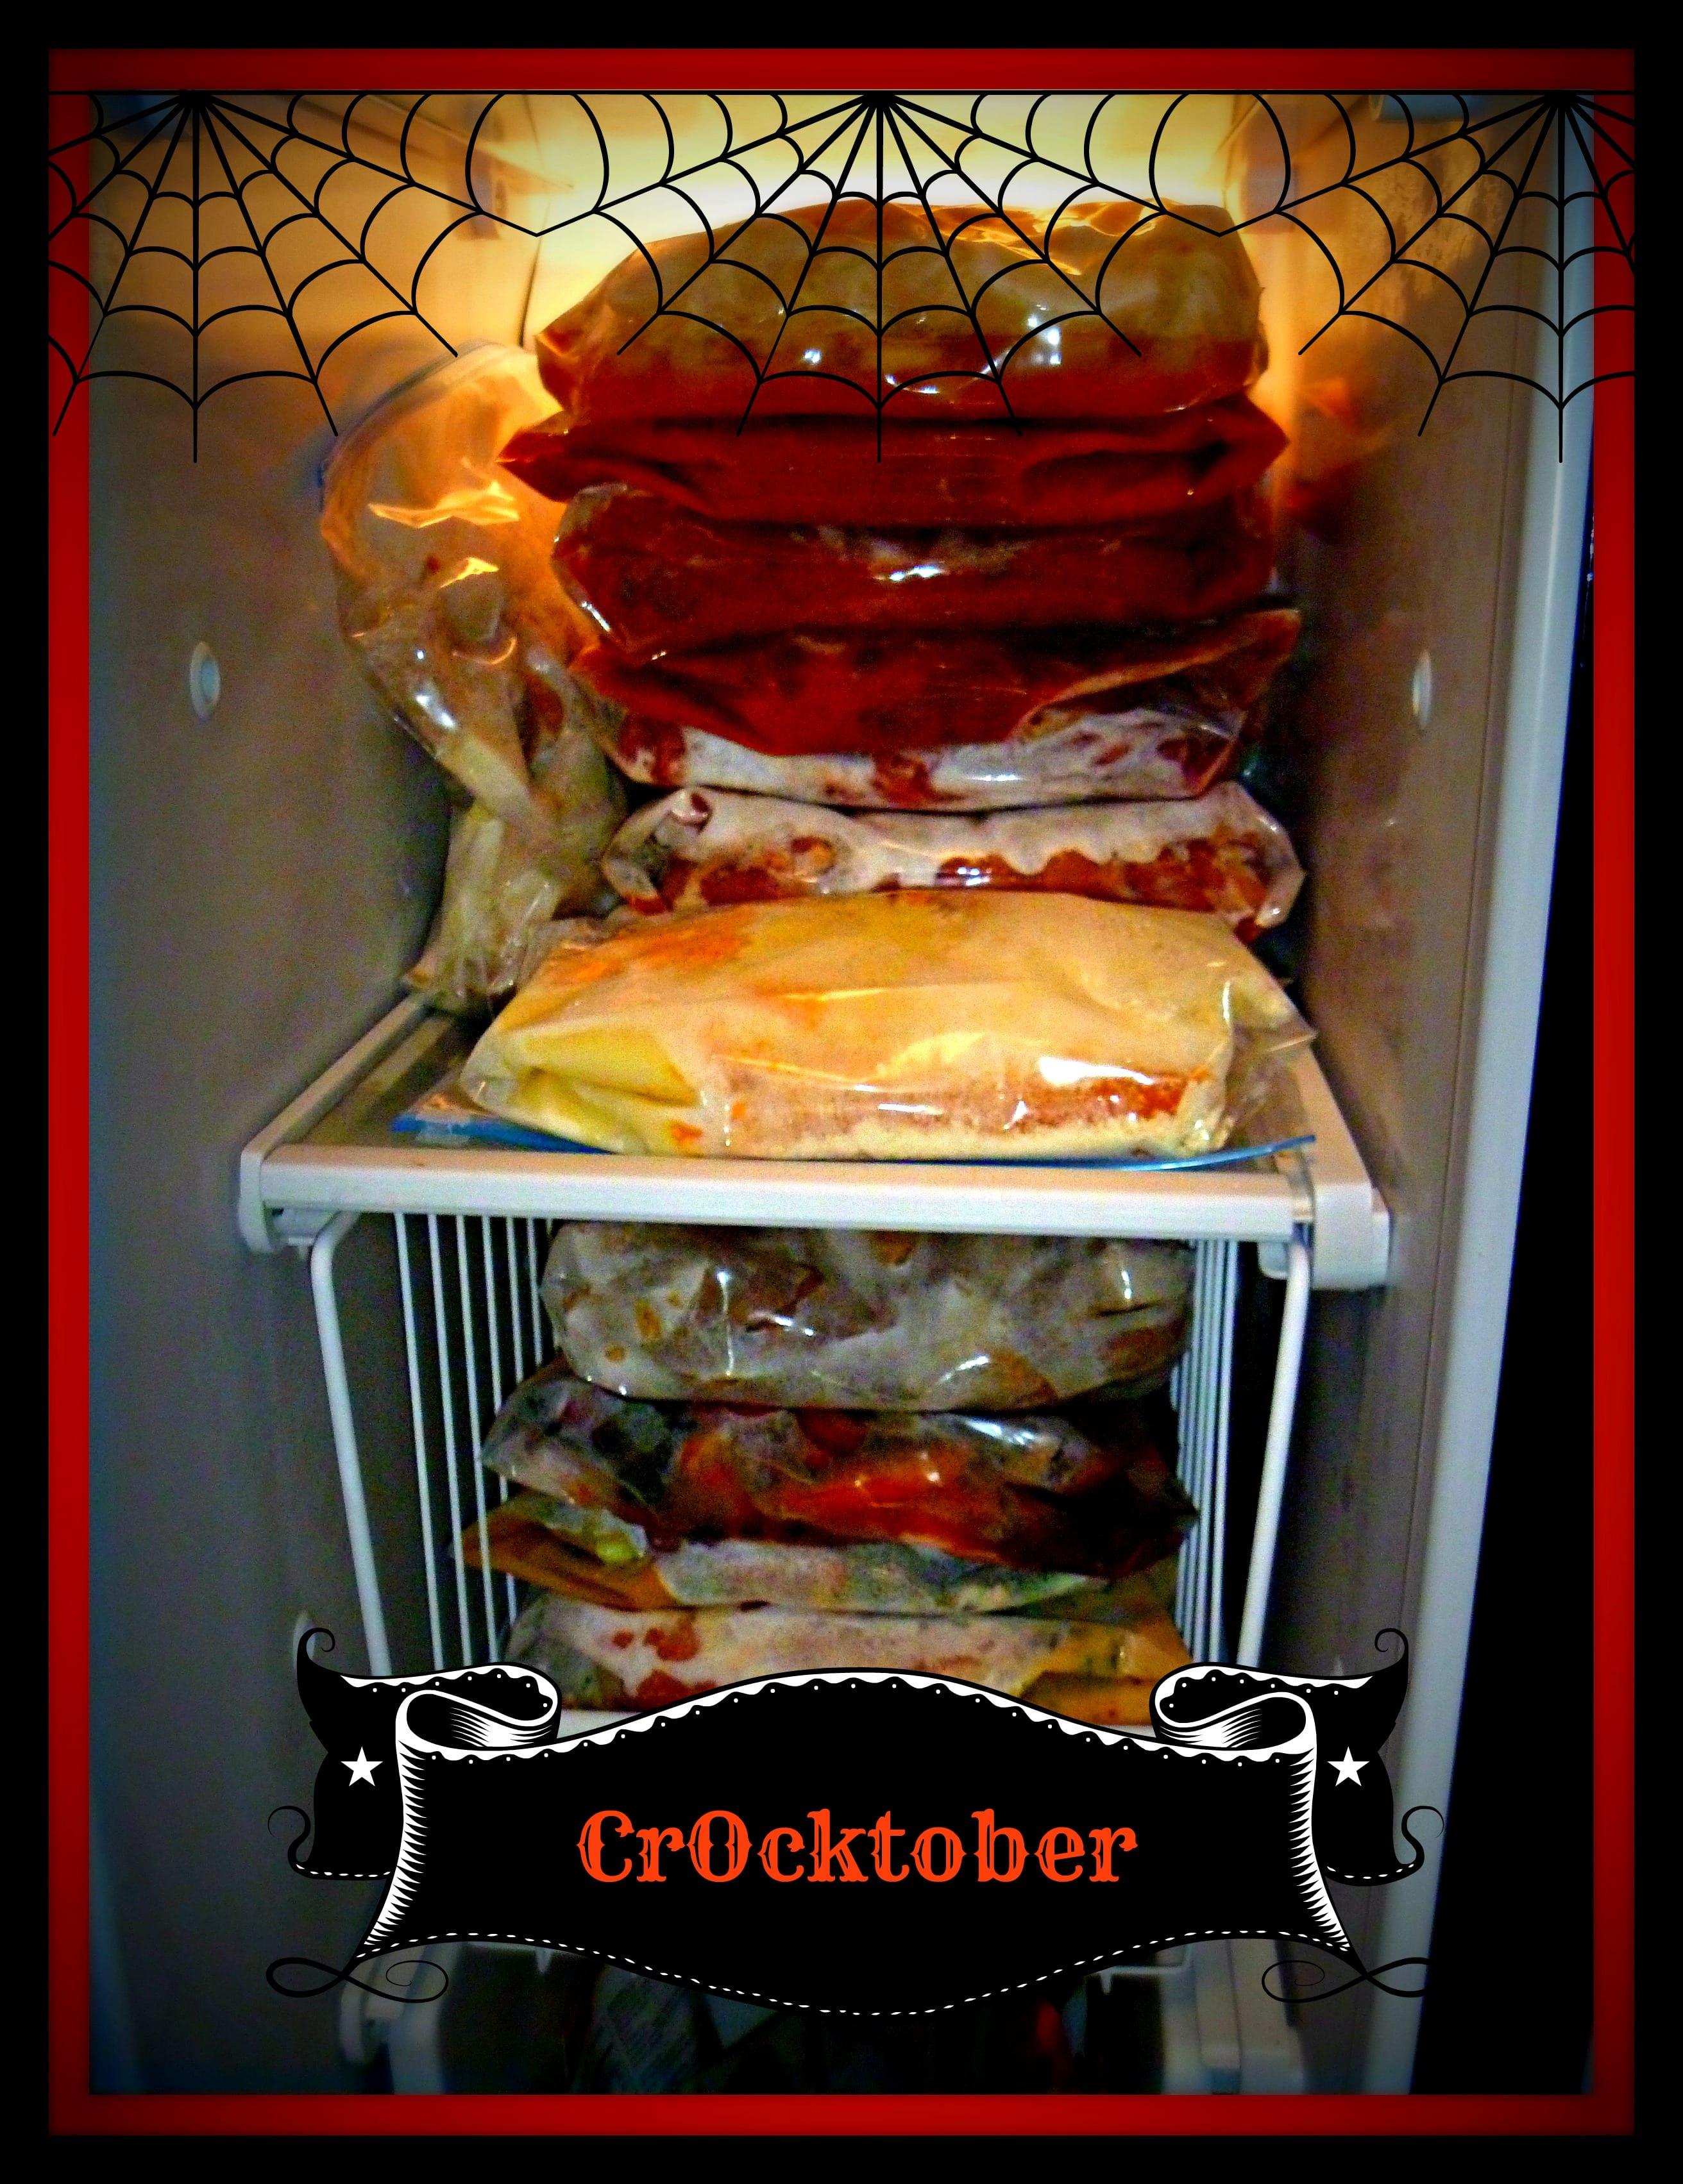 croctober